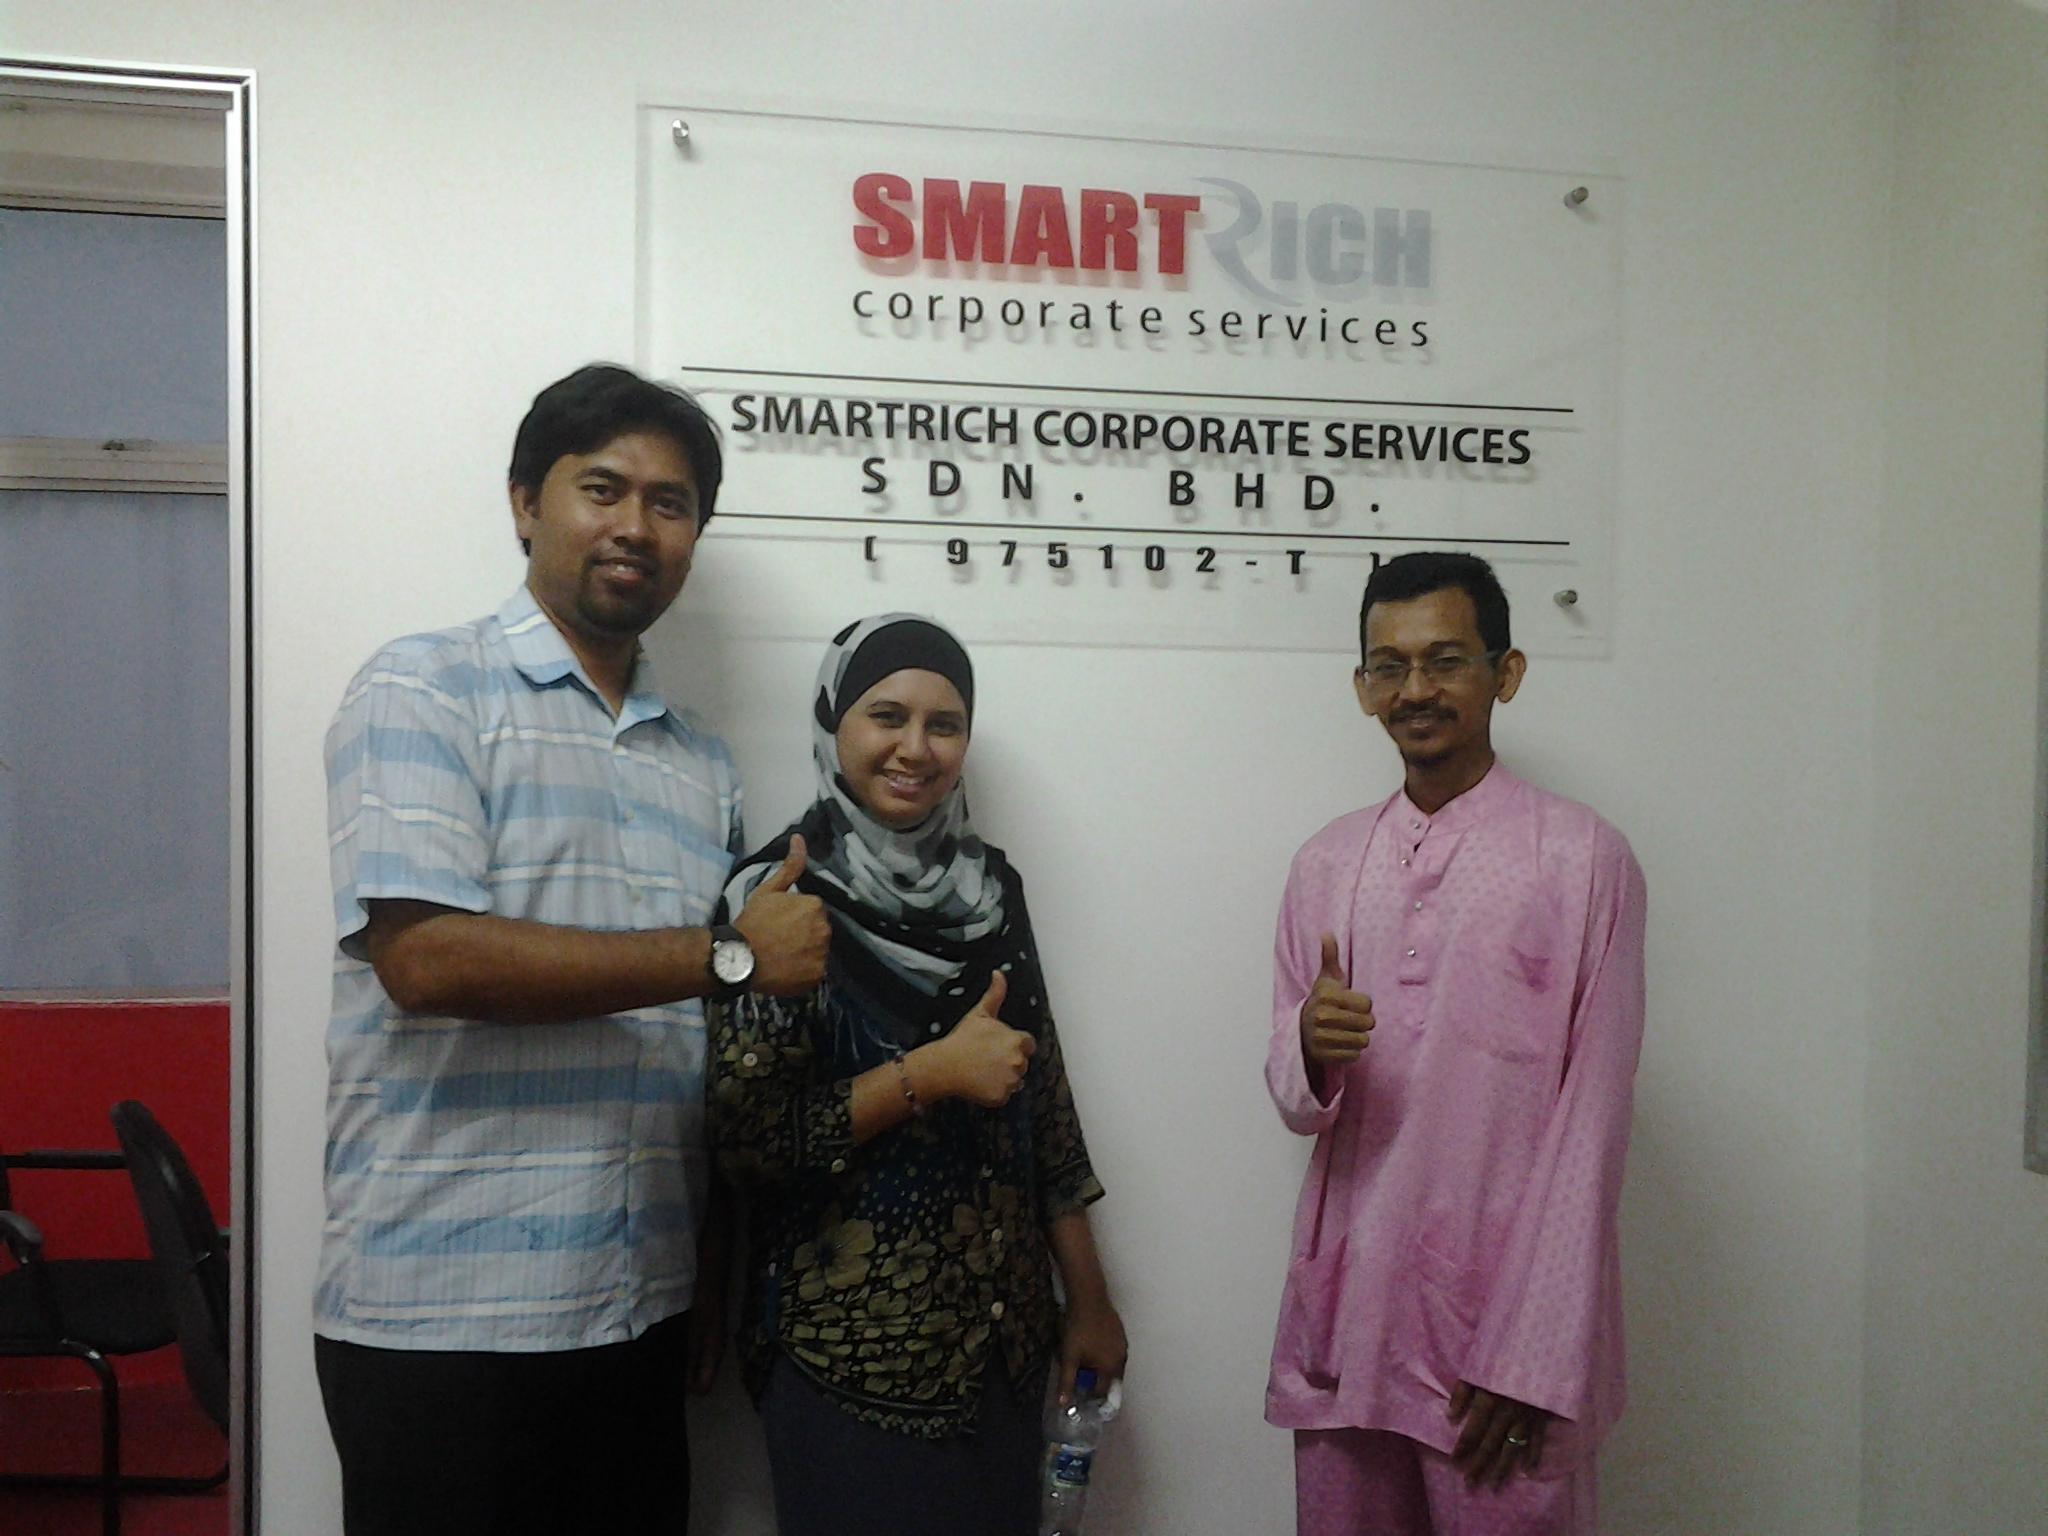 Secretarial Services – Scoopworks Sdn. Bhd.